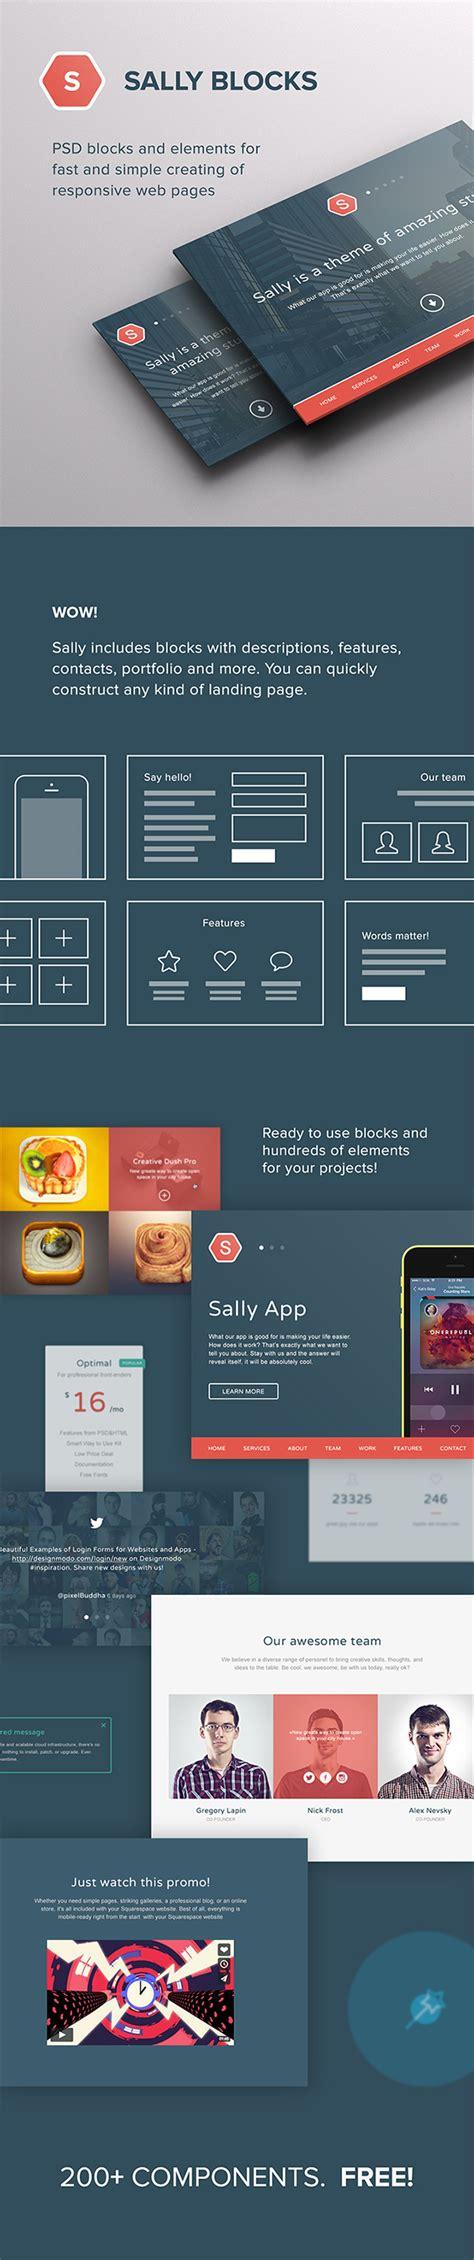 wordpress layout blocks sally blocks responsive joomla and wordpress themes